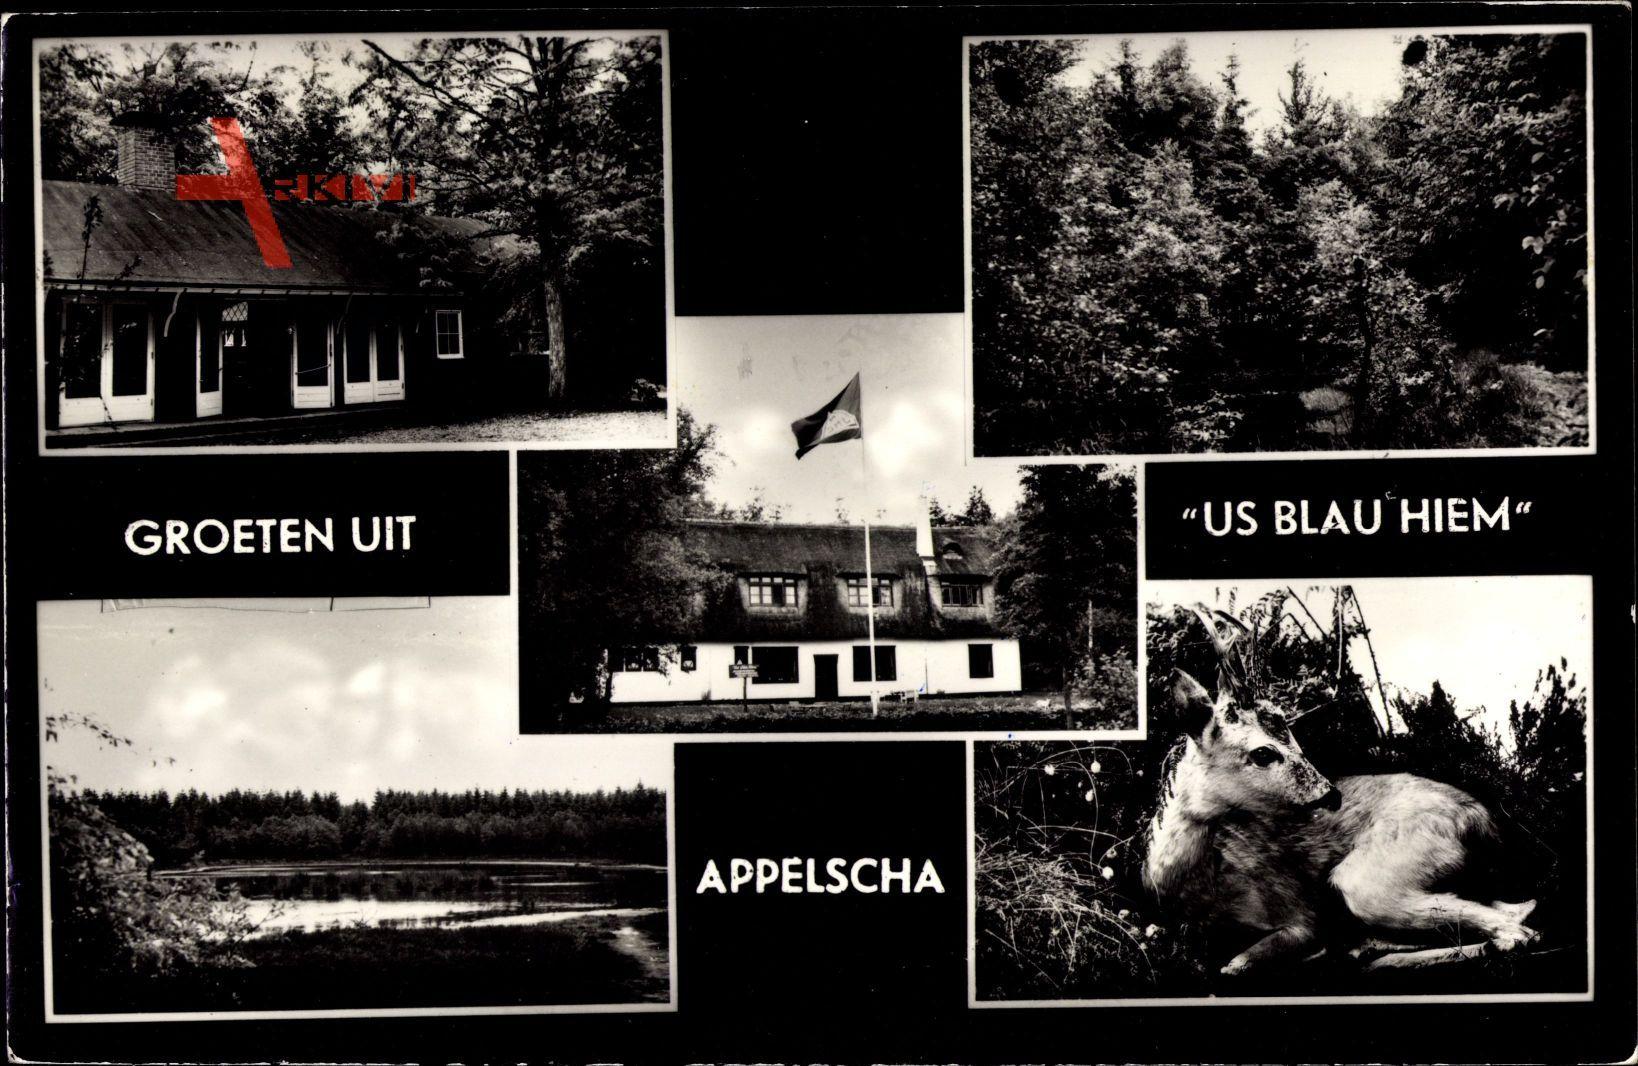 Appelscha Friesland Niederlande, Us Blau Hiem, Jeugdherberg Kamphuis, Reh